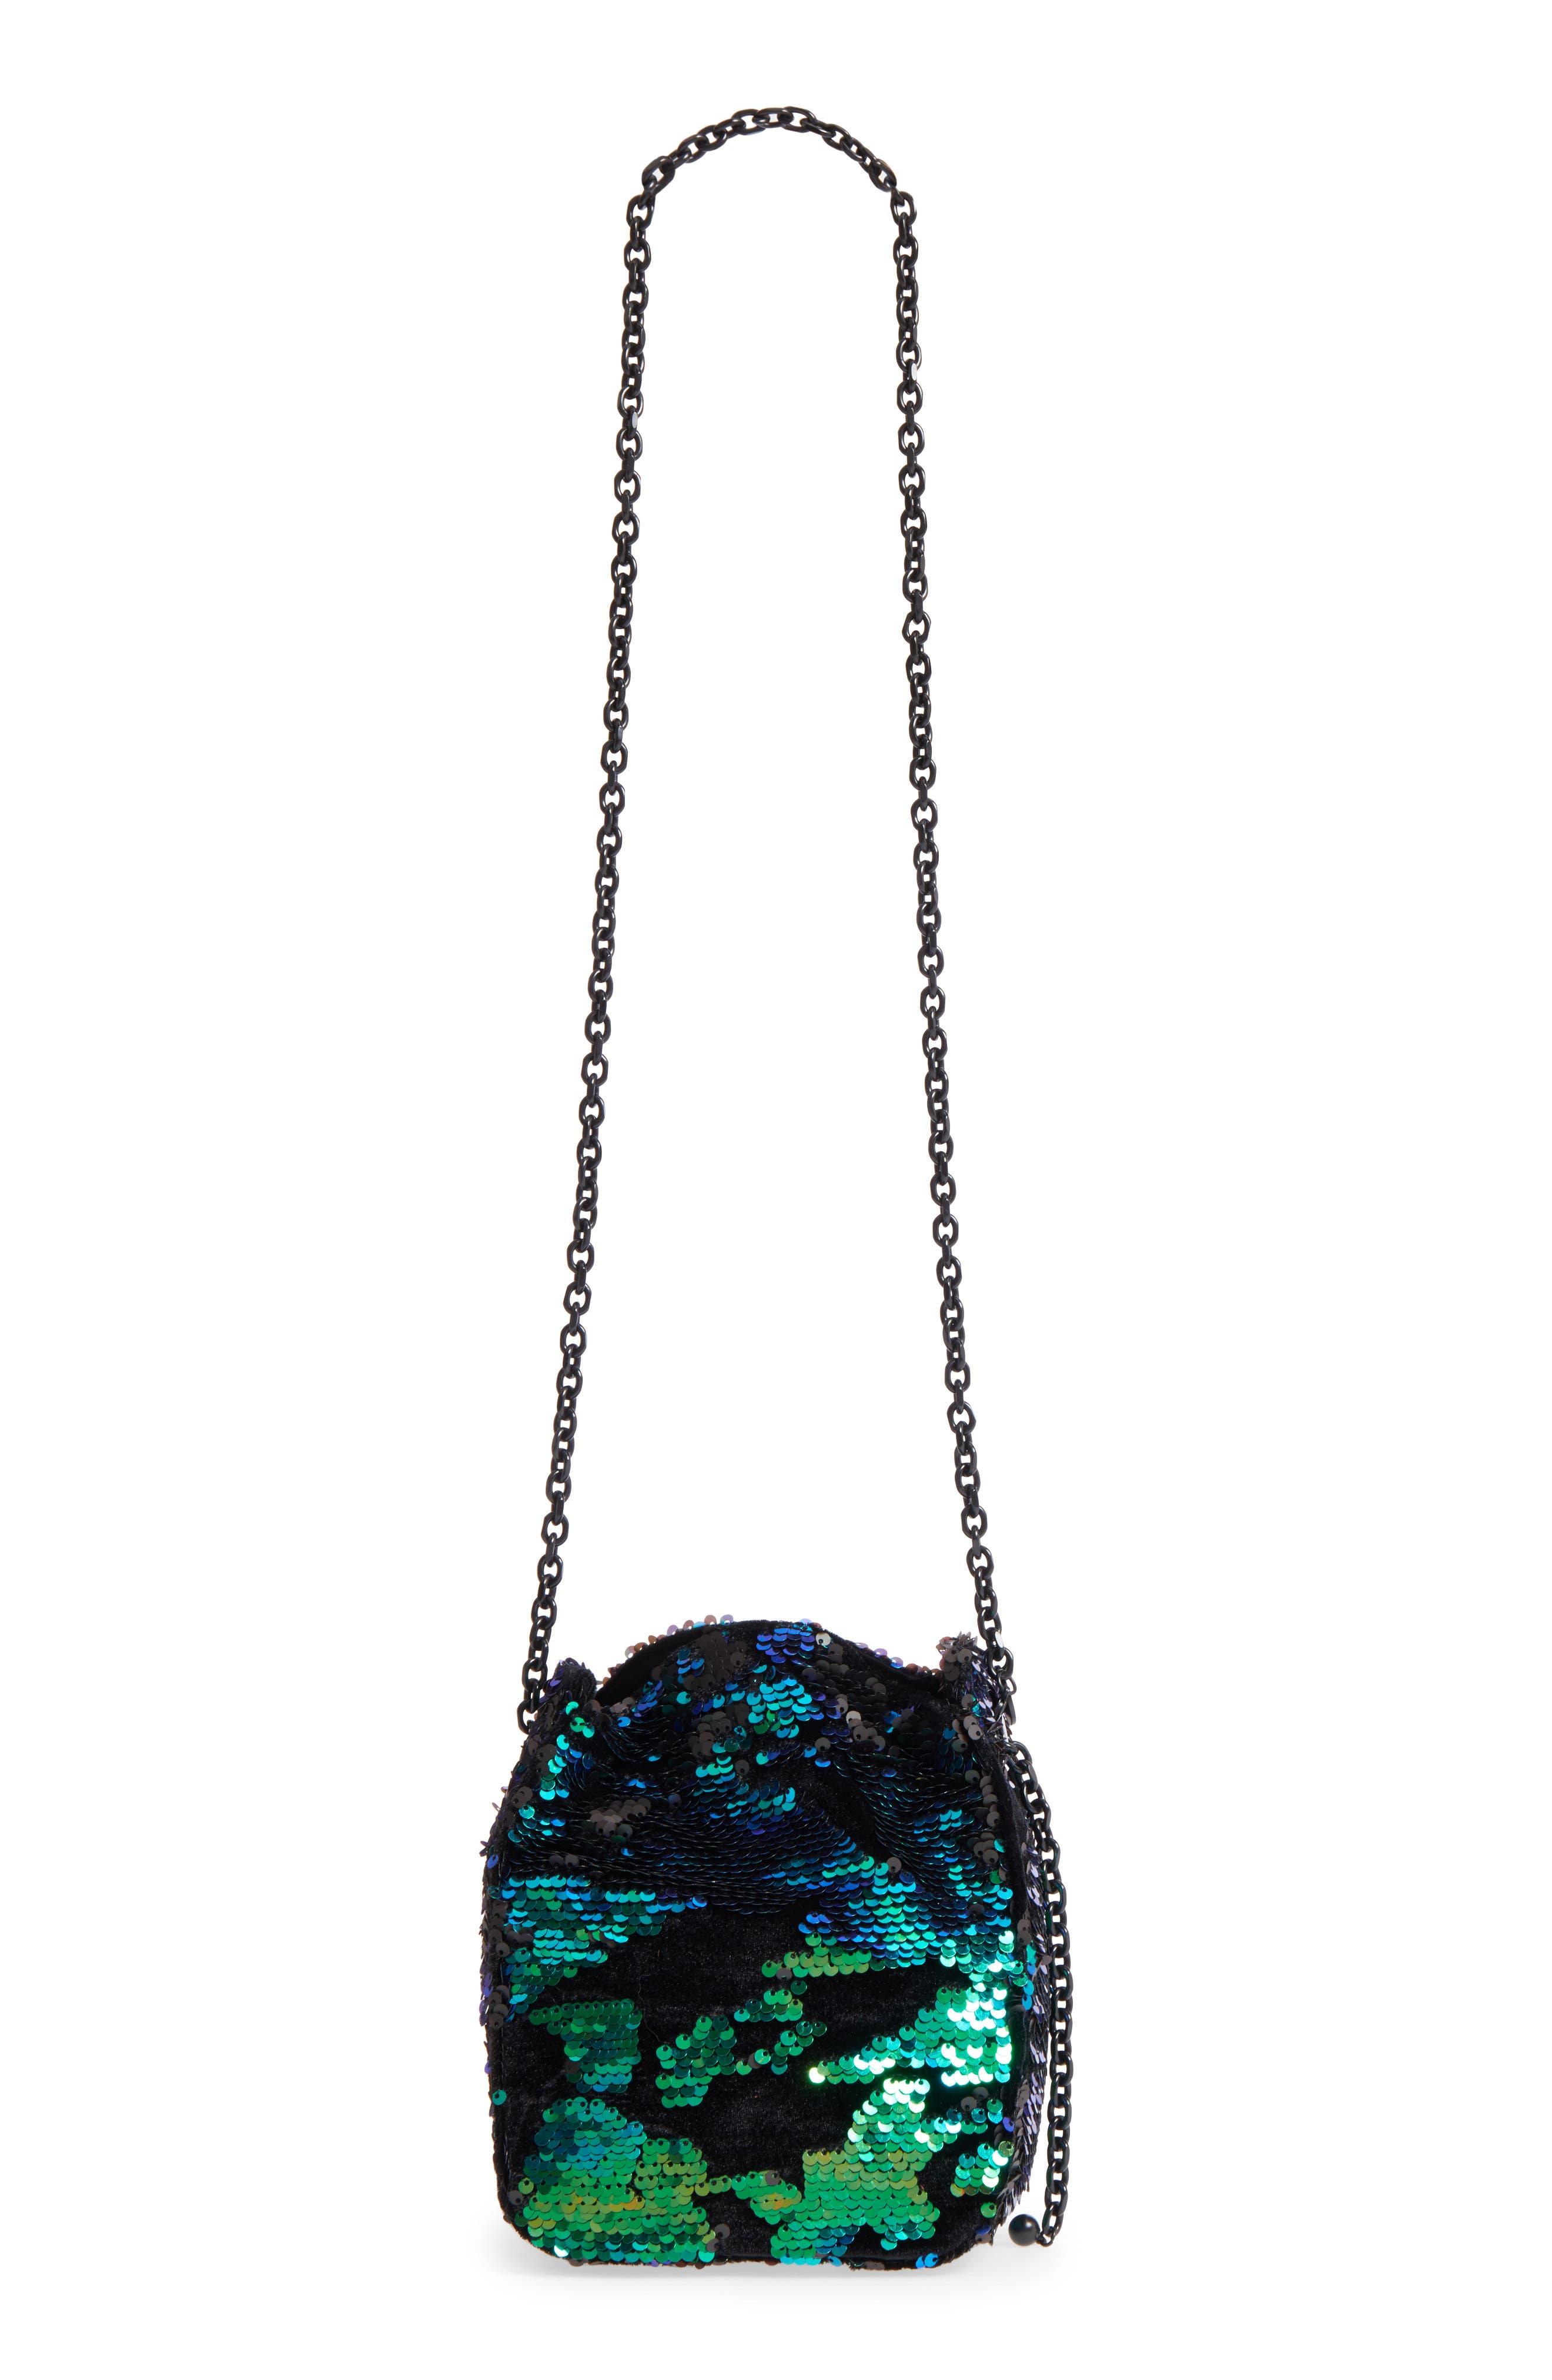 Amy Sequin Bucket Bag,                             Main thumbnail 1, color,                             Iridescent Sequins